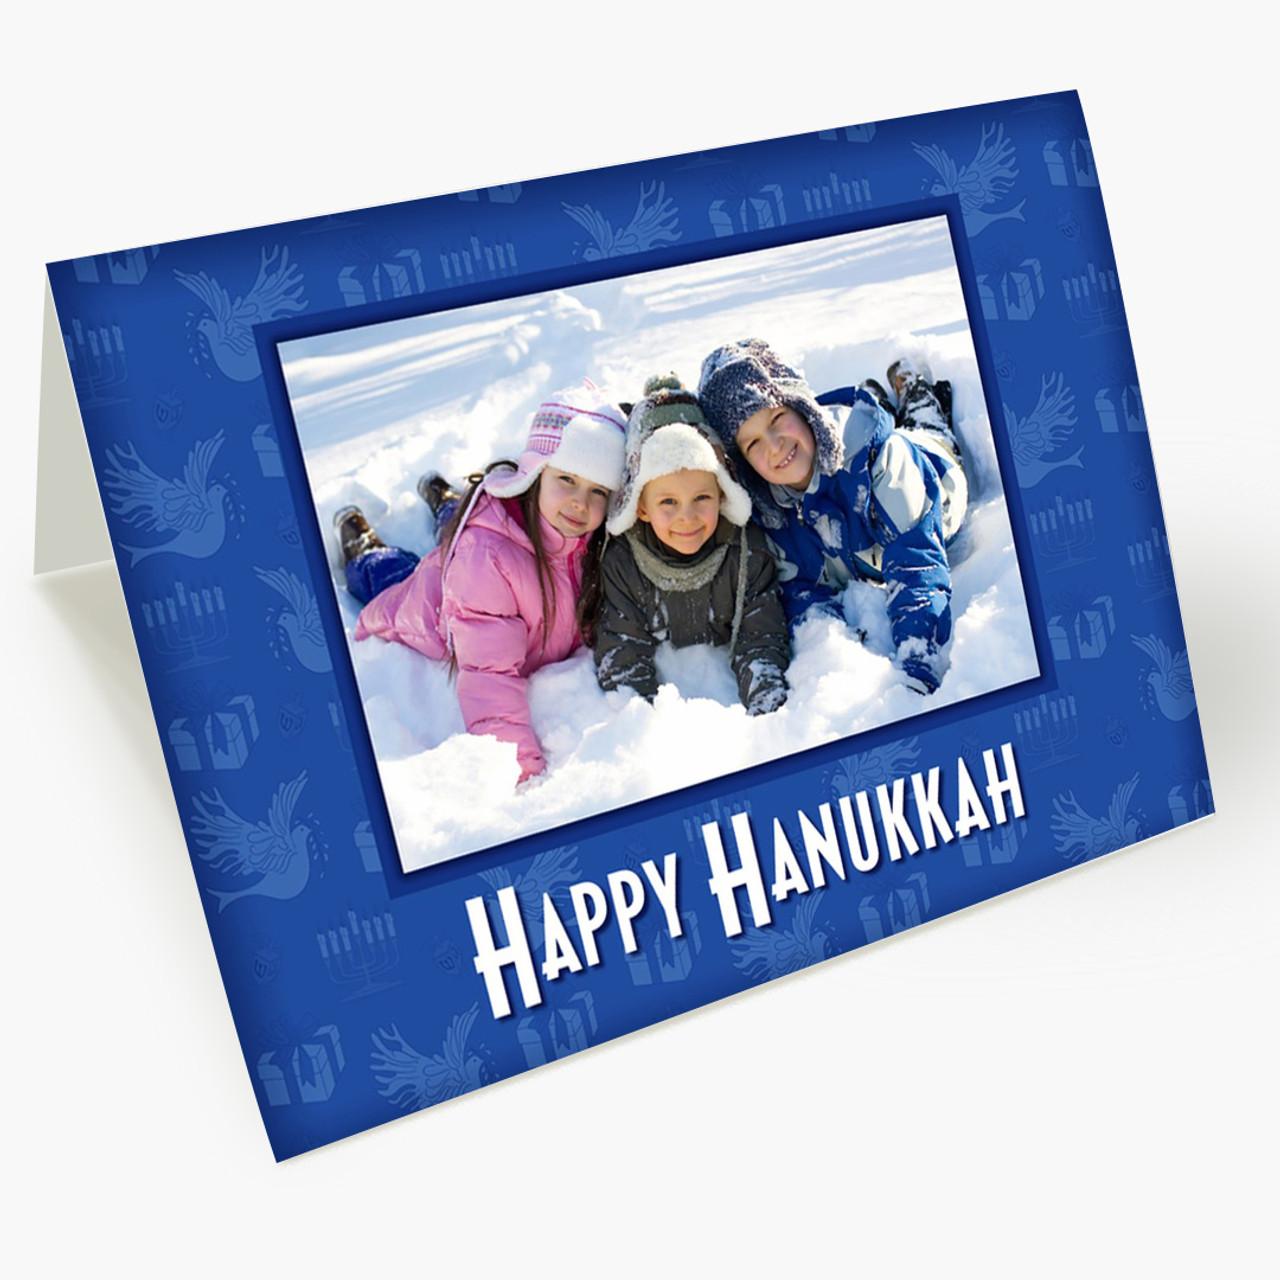 Hanukkah Photo Card - Matte Finish